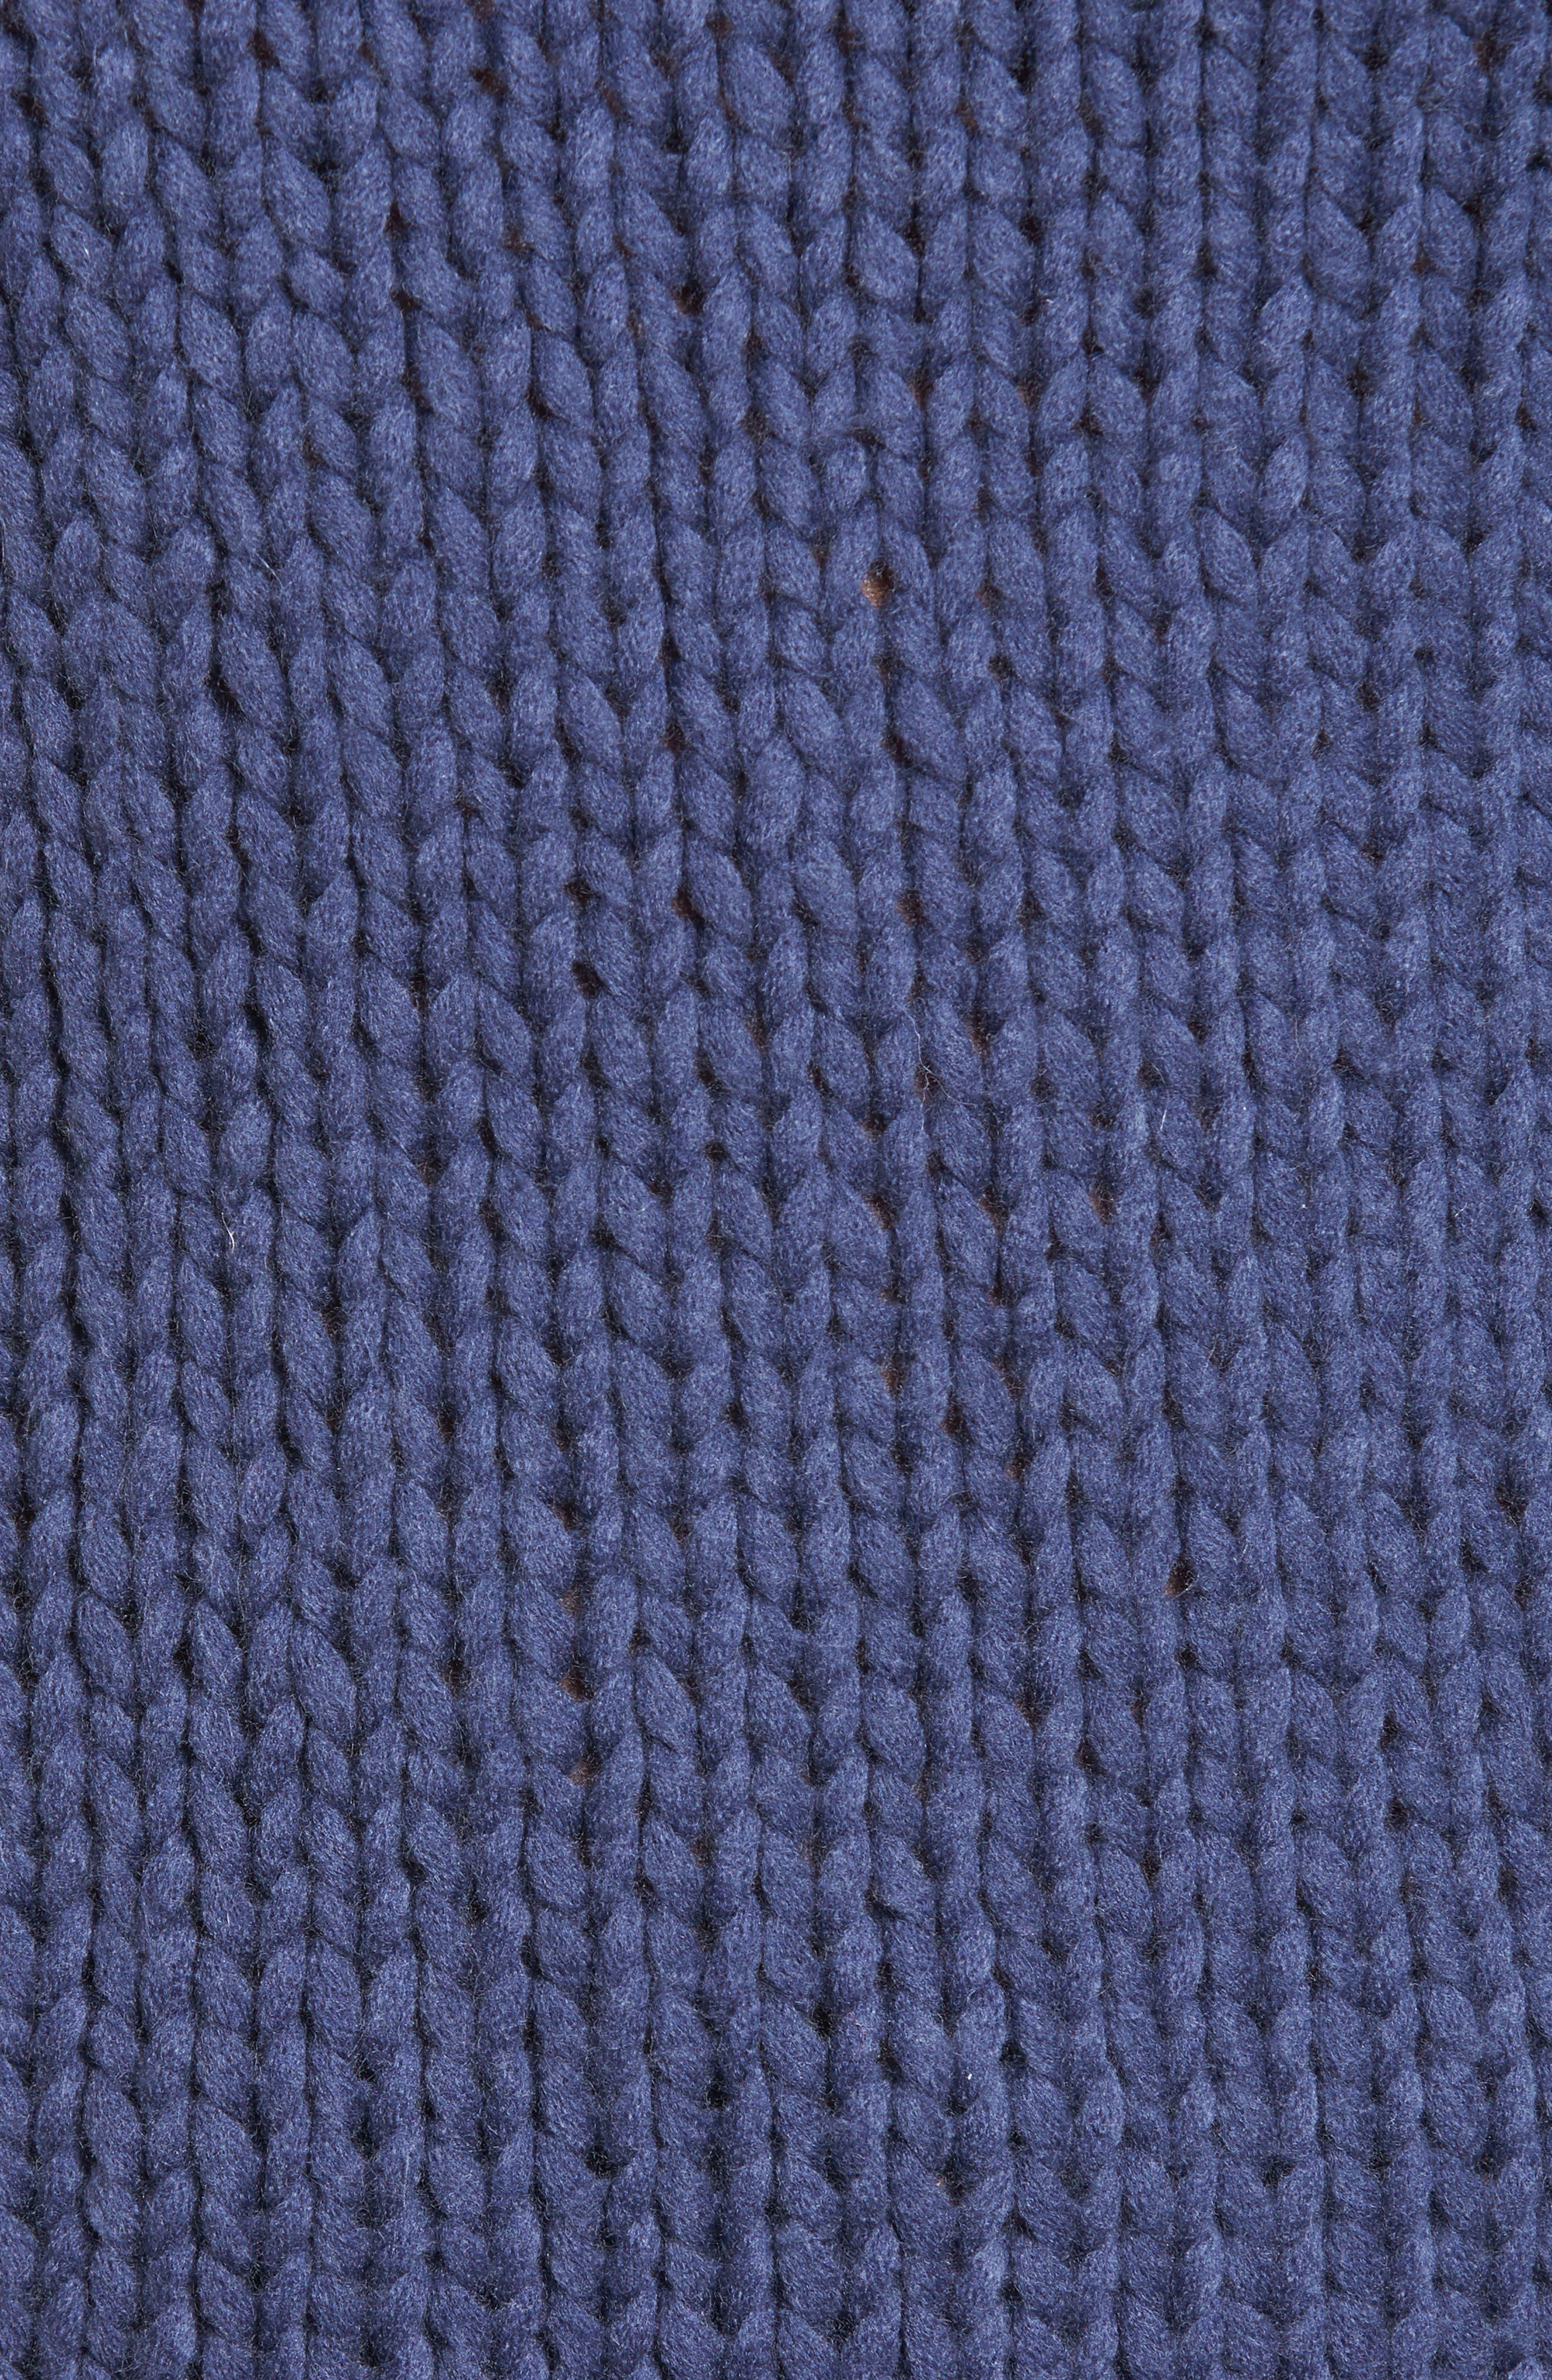 Hawken Turtleneck Sweater,                             Alternate thumbnail 5, color,                             400